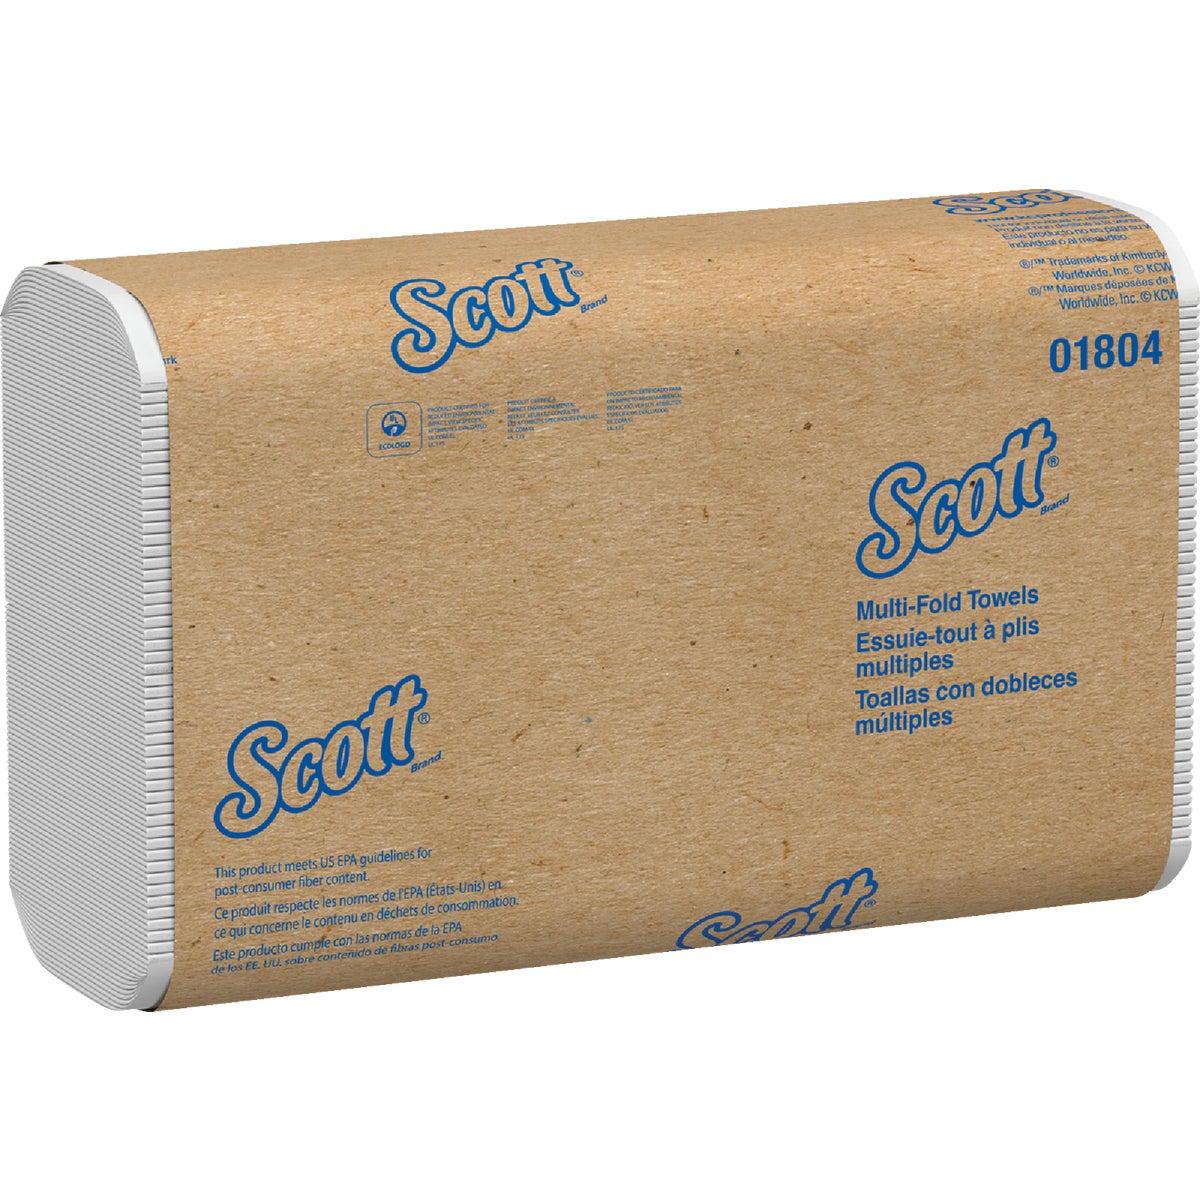 M-FOLD PAPER TOWELS - KCC01804 by Lagassesweet  Incom